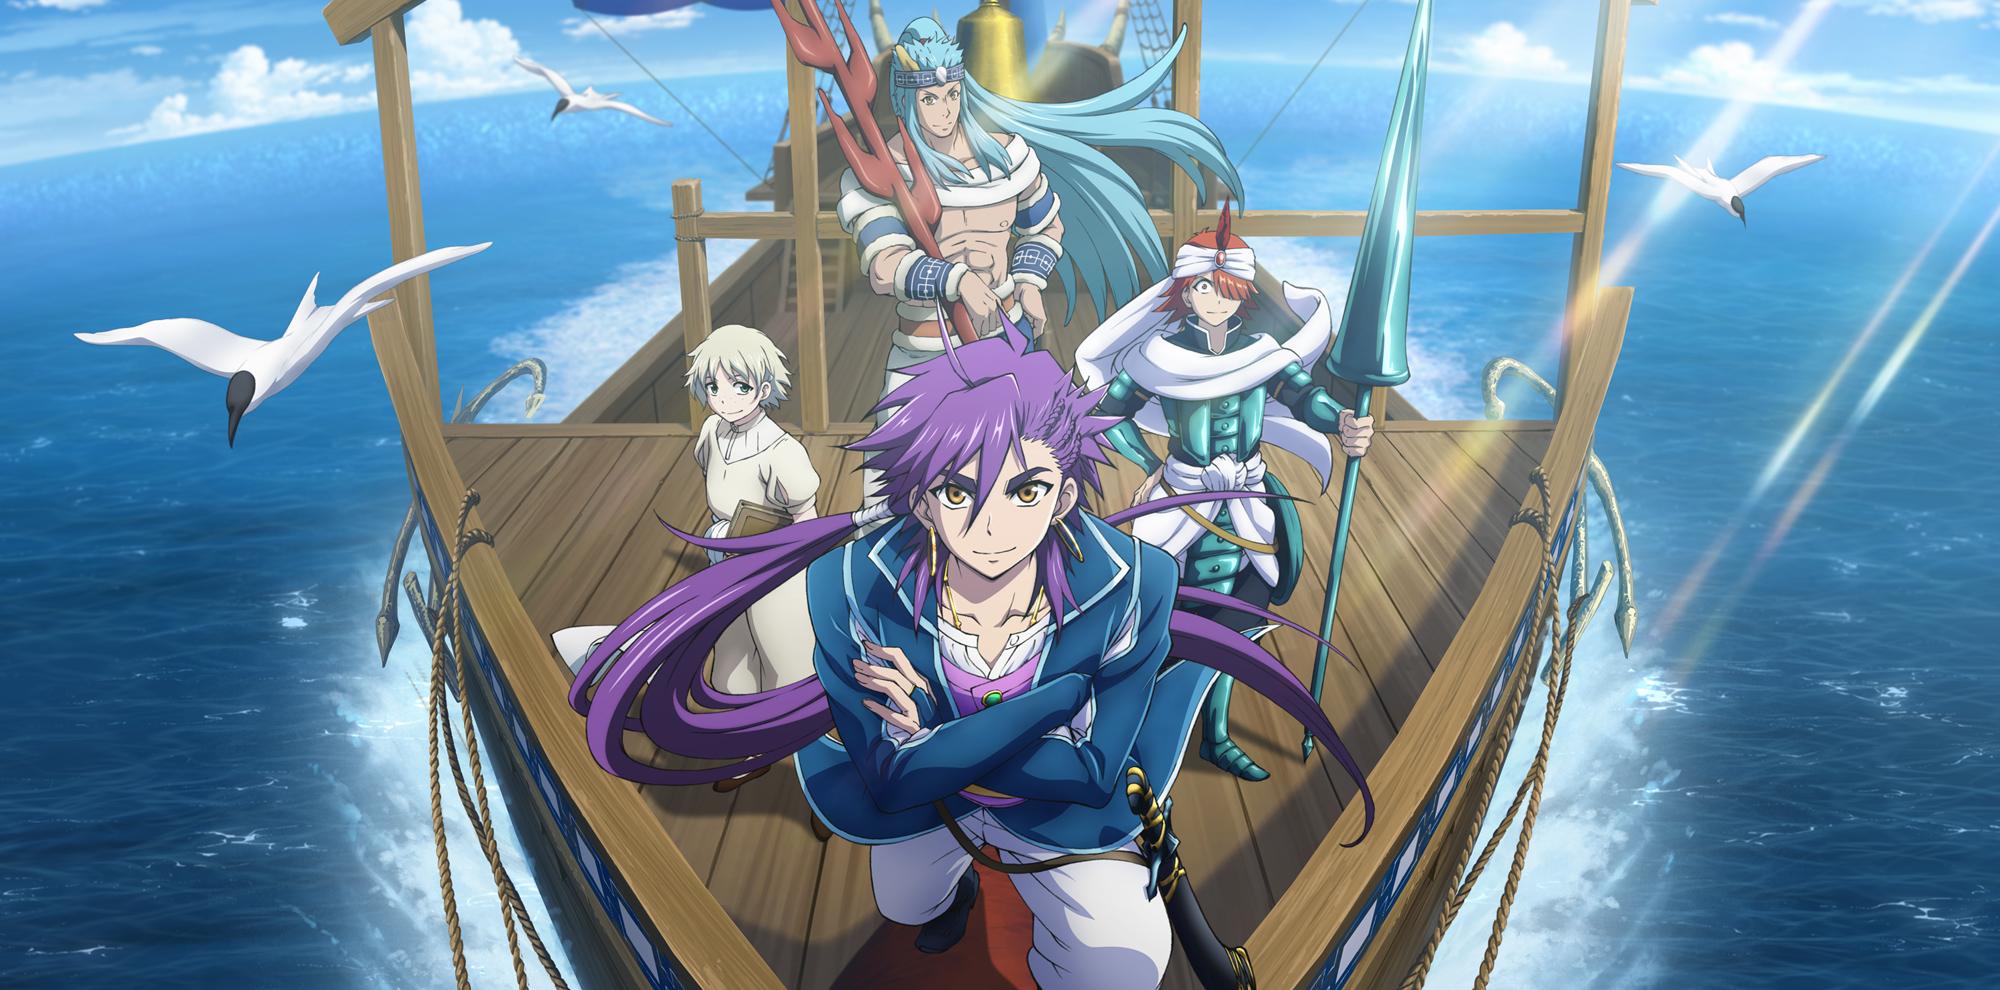 Magi Sinbad no Bouken TV Anime Visual Revealed